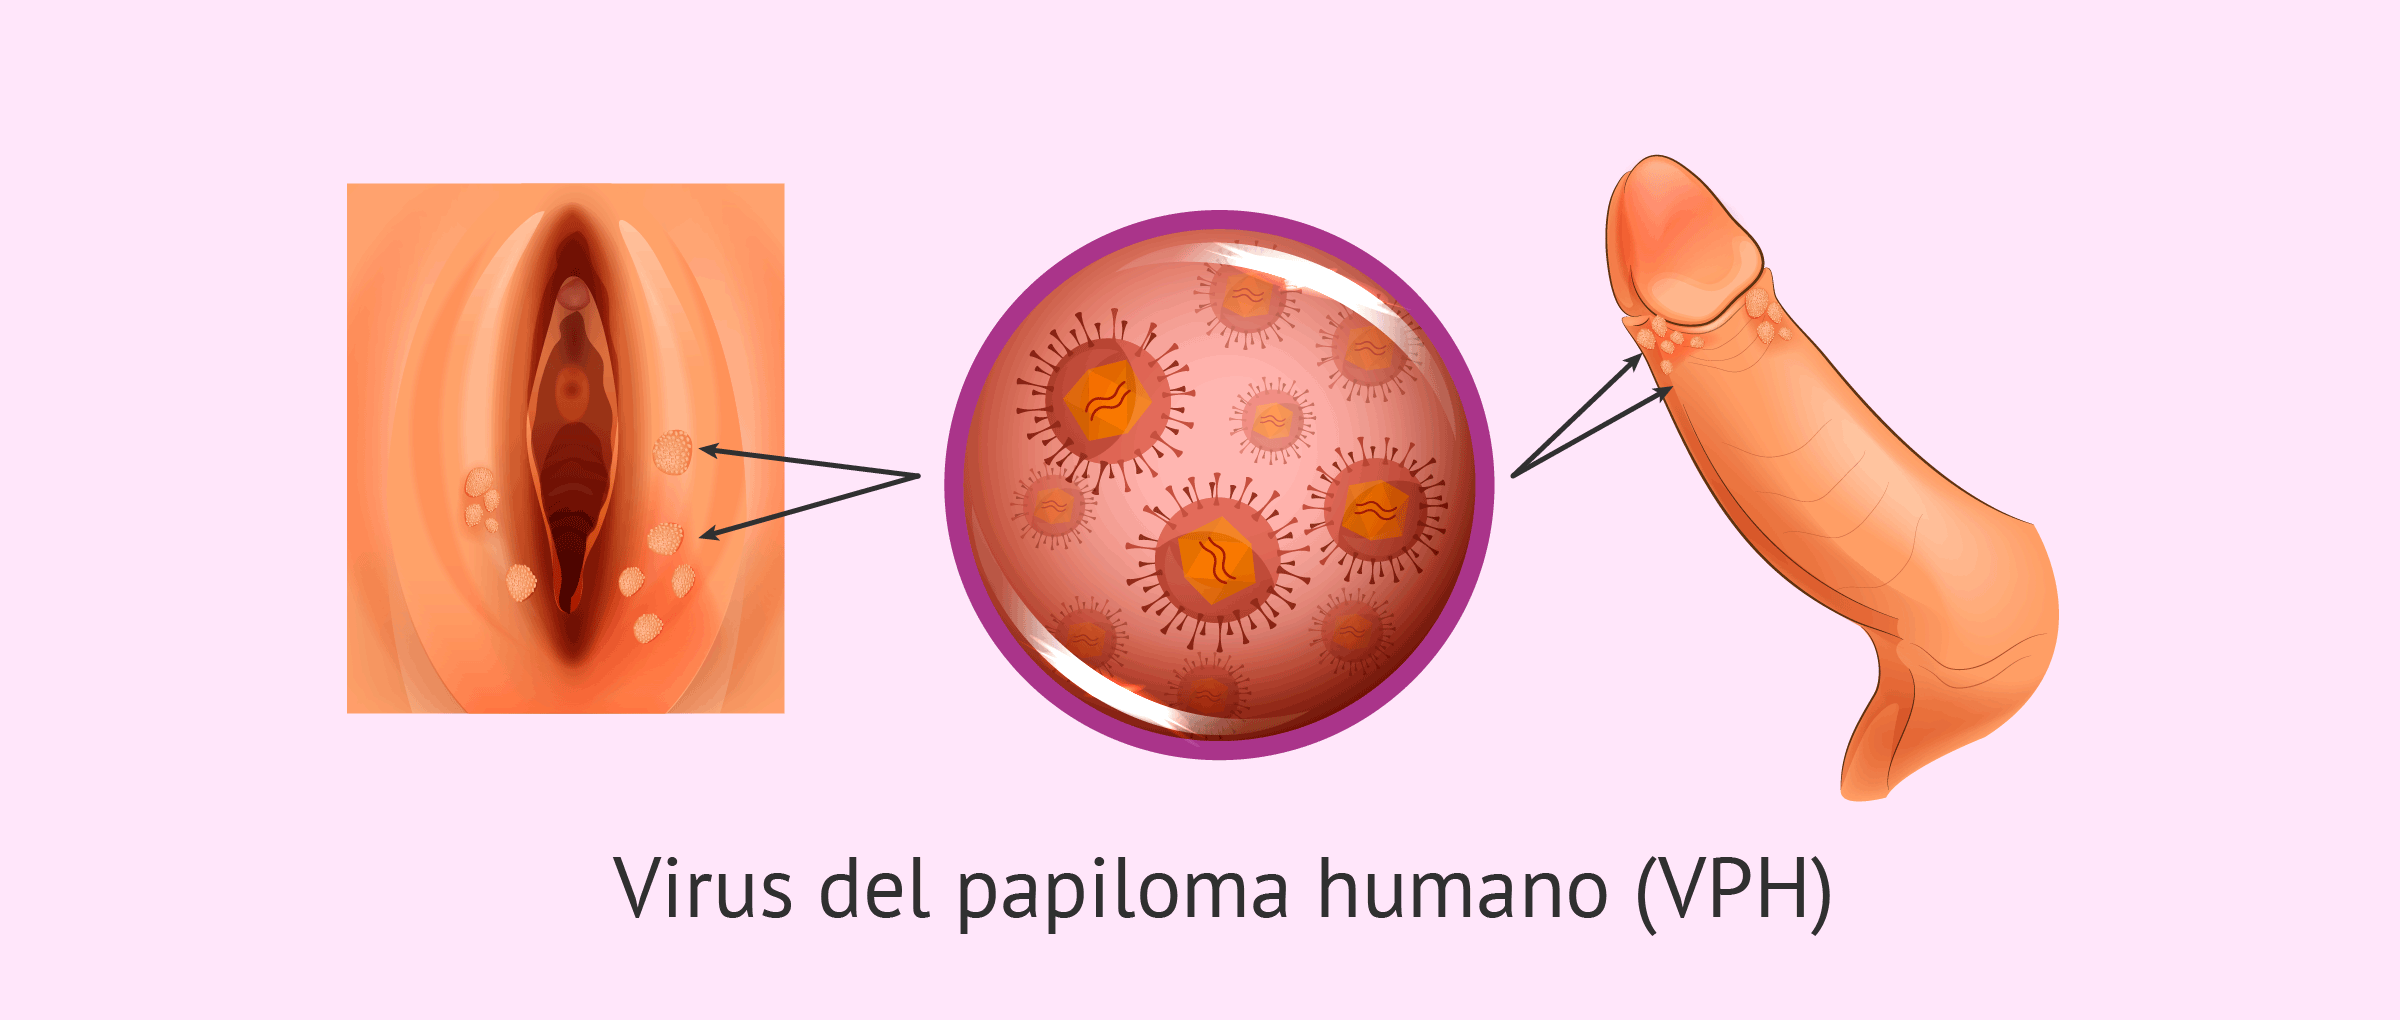 verrugas genitales por virus papiloma humano